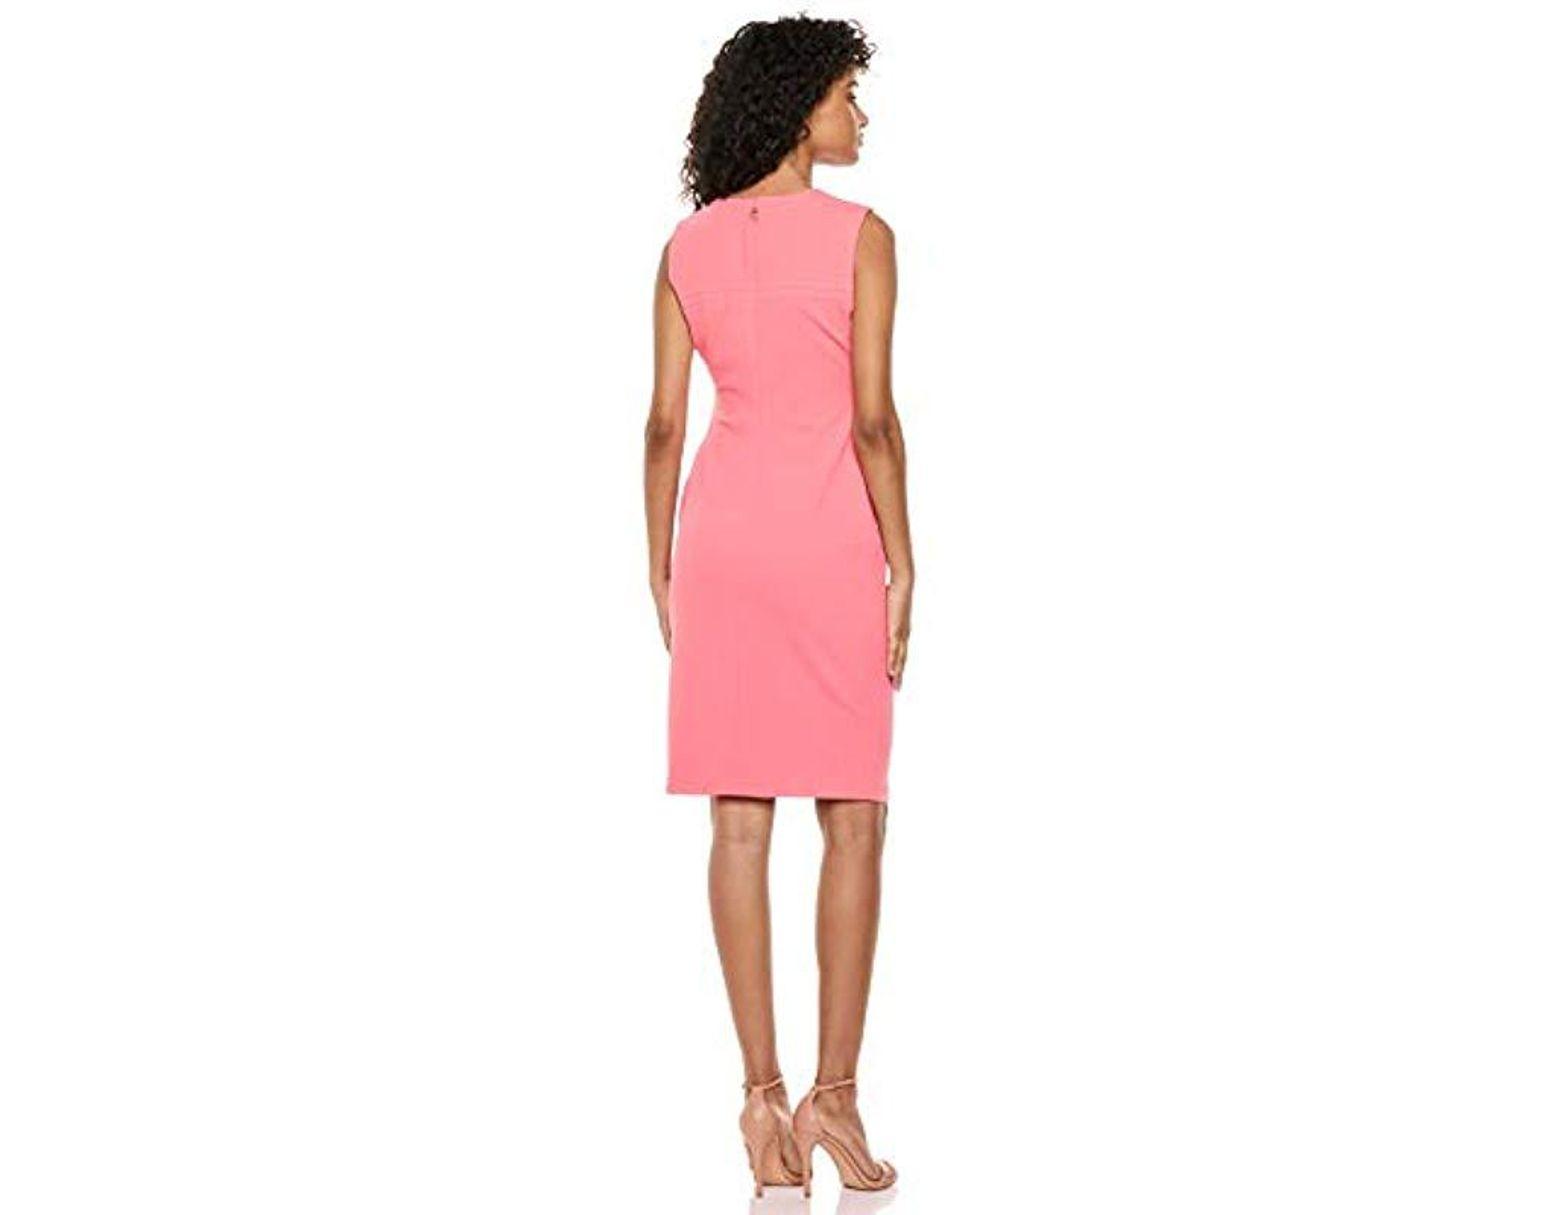 1bc6a36b03d72 Tommy Hilfiger Assymetrical Top Stitch Sheath in Pink - Lyst